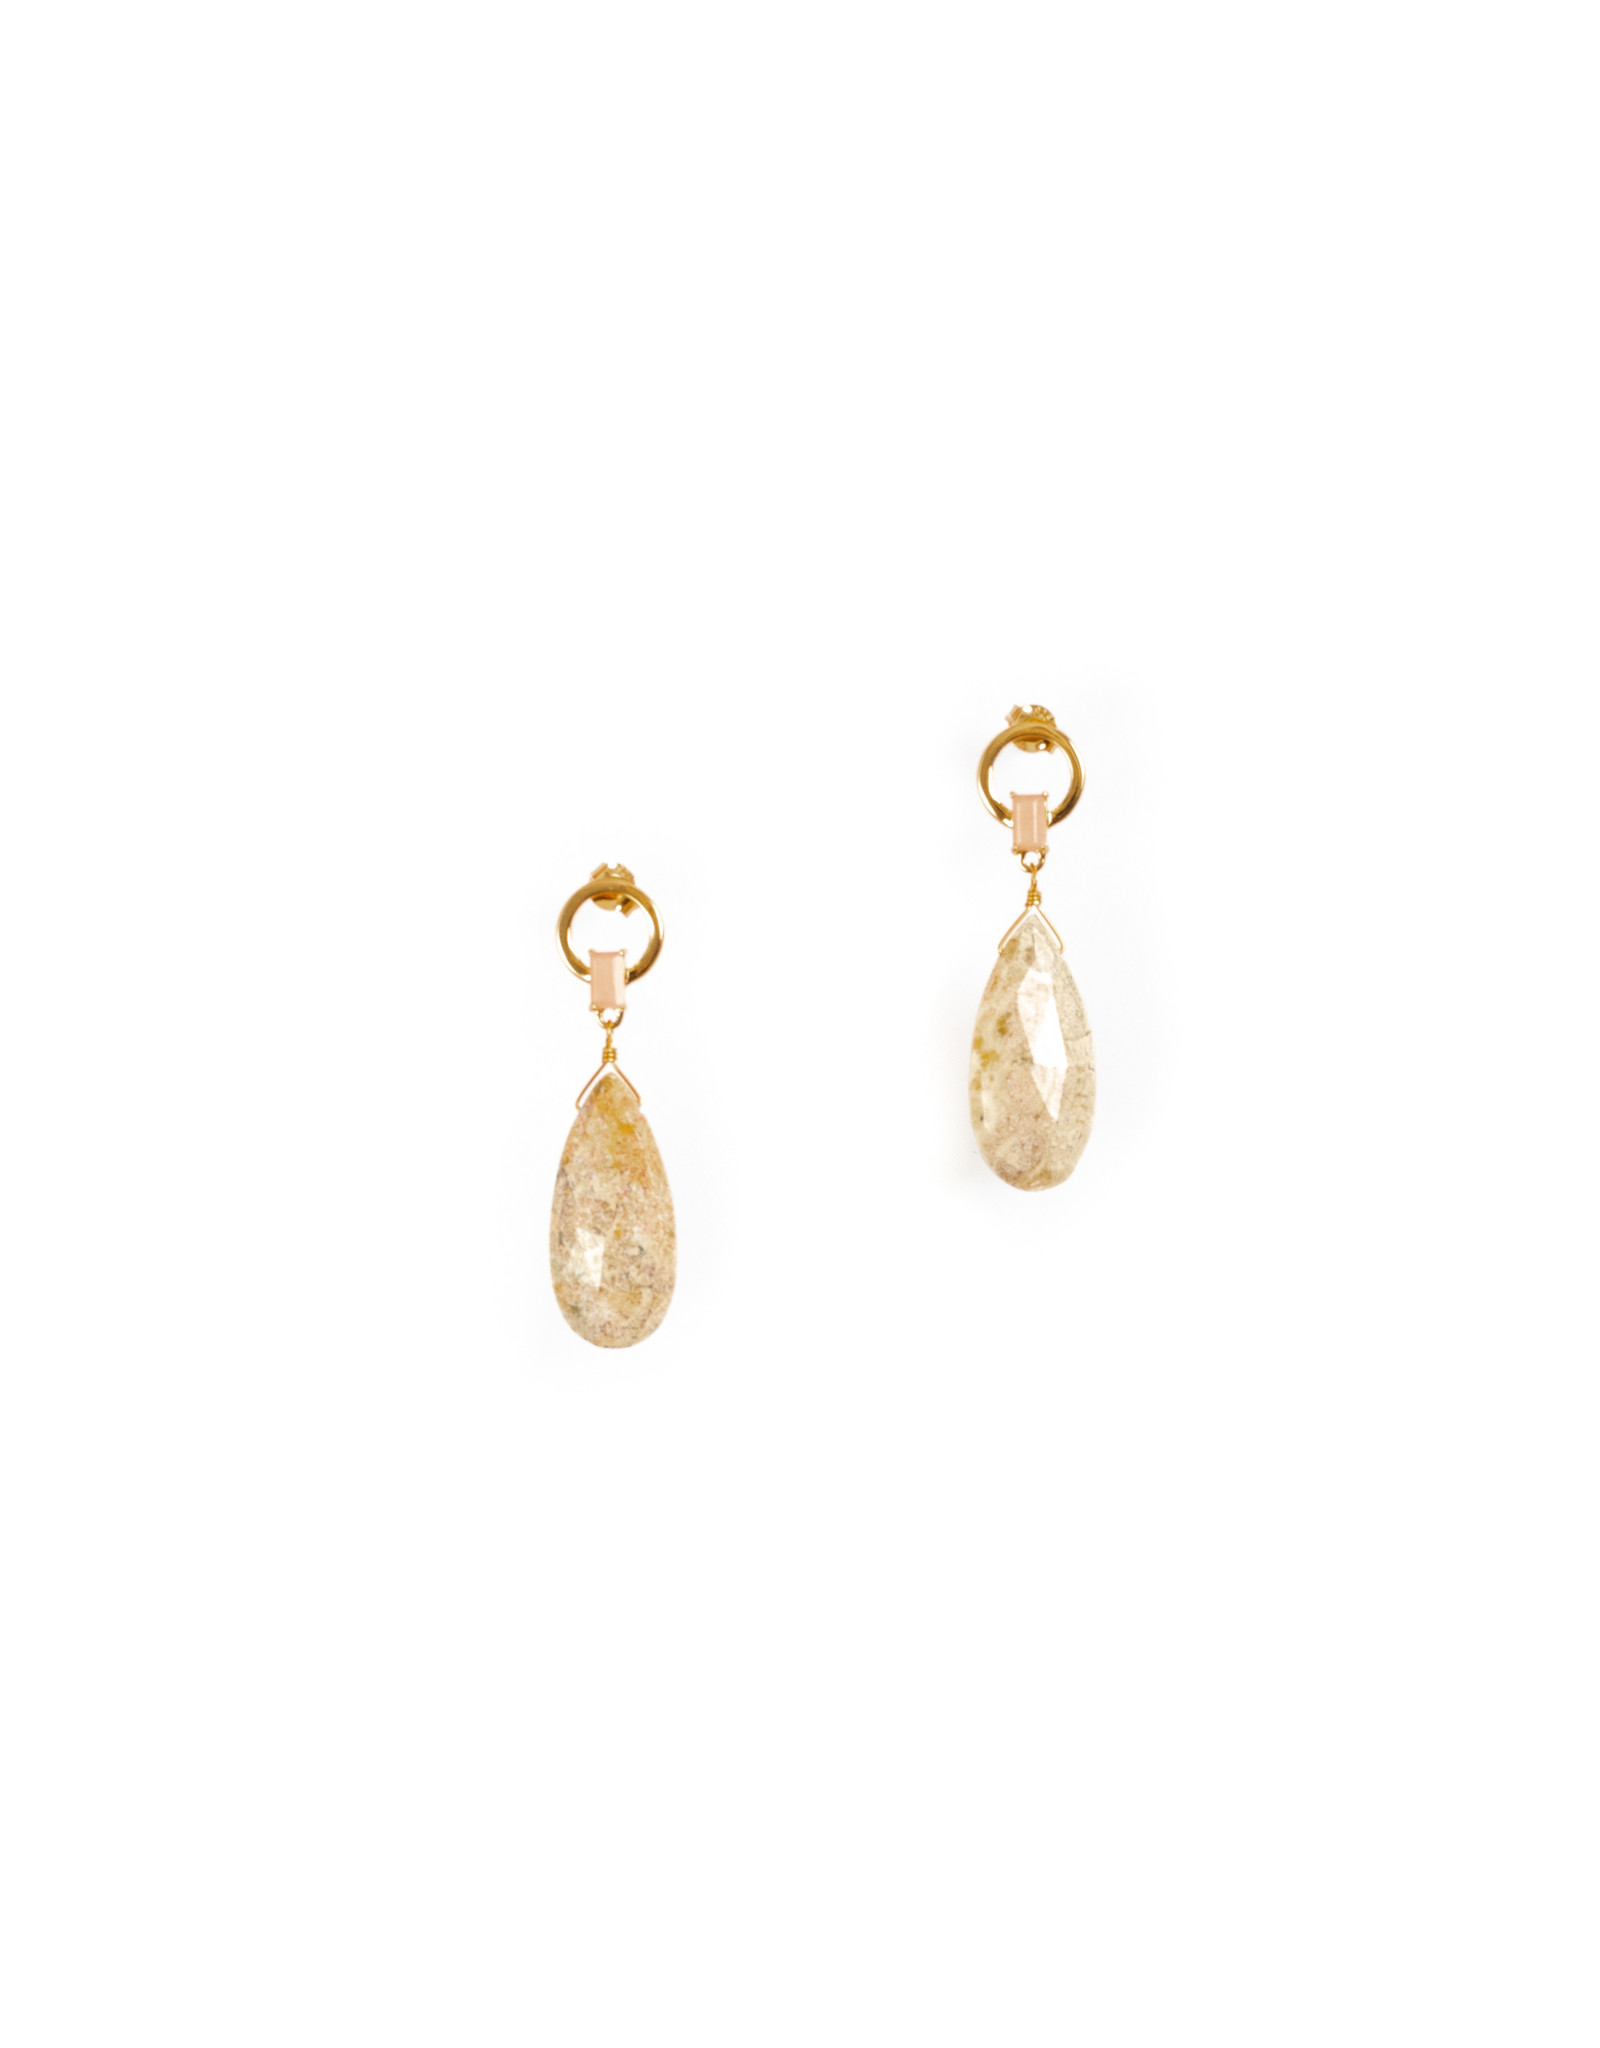 Hailey Gerrits Sima Earrings Peach Moonstone